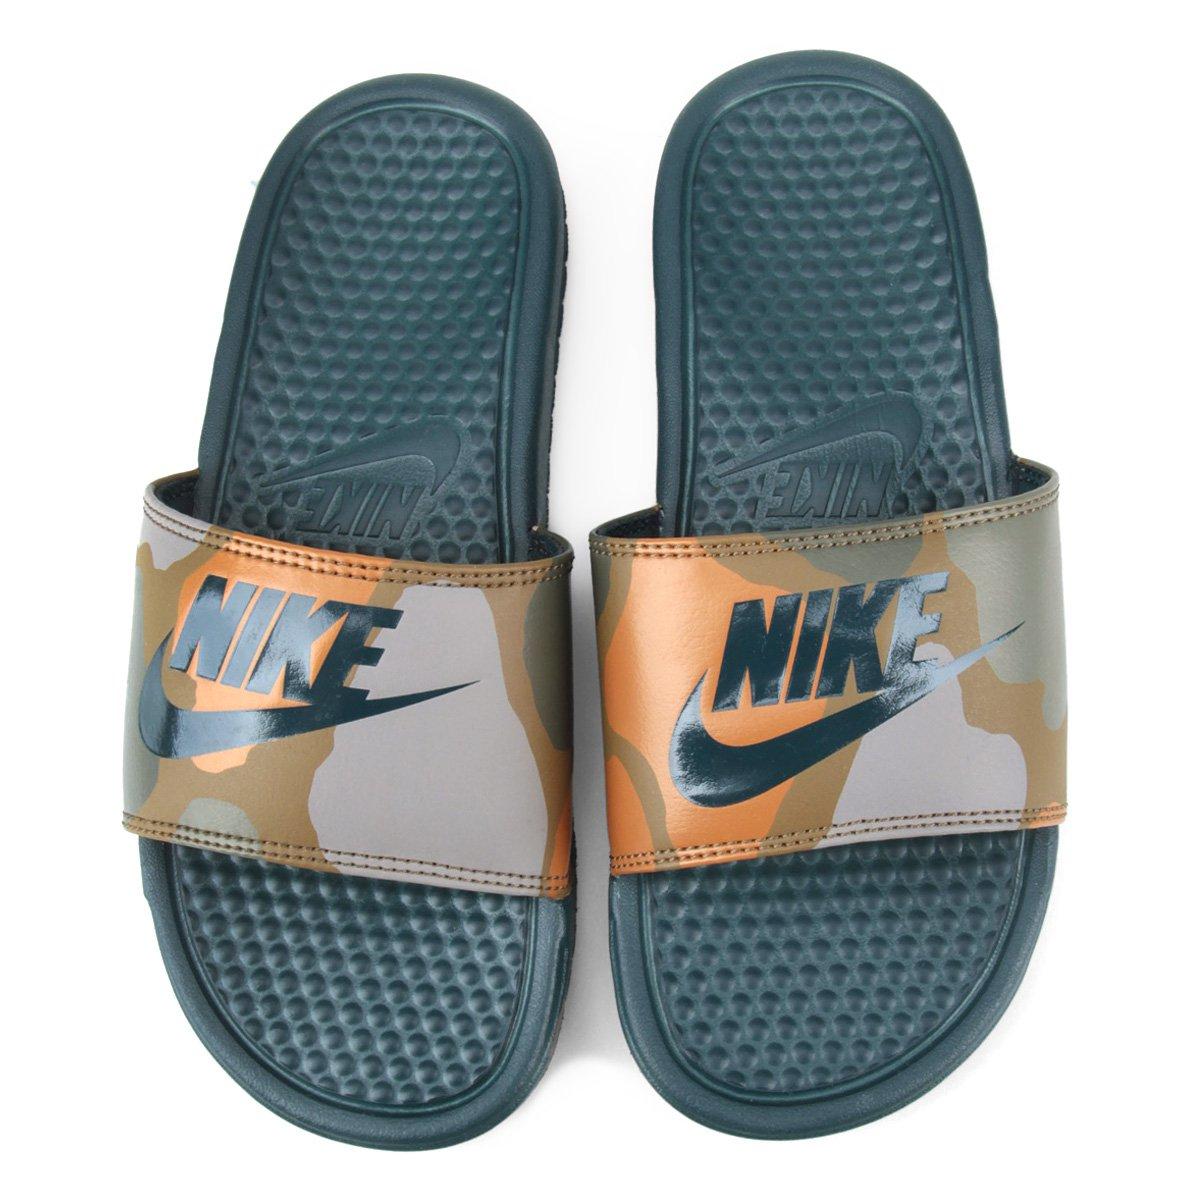 2f567eb42 Chinelo Nike Benassi Jdi Print - Camuflado - Compre Agora